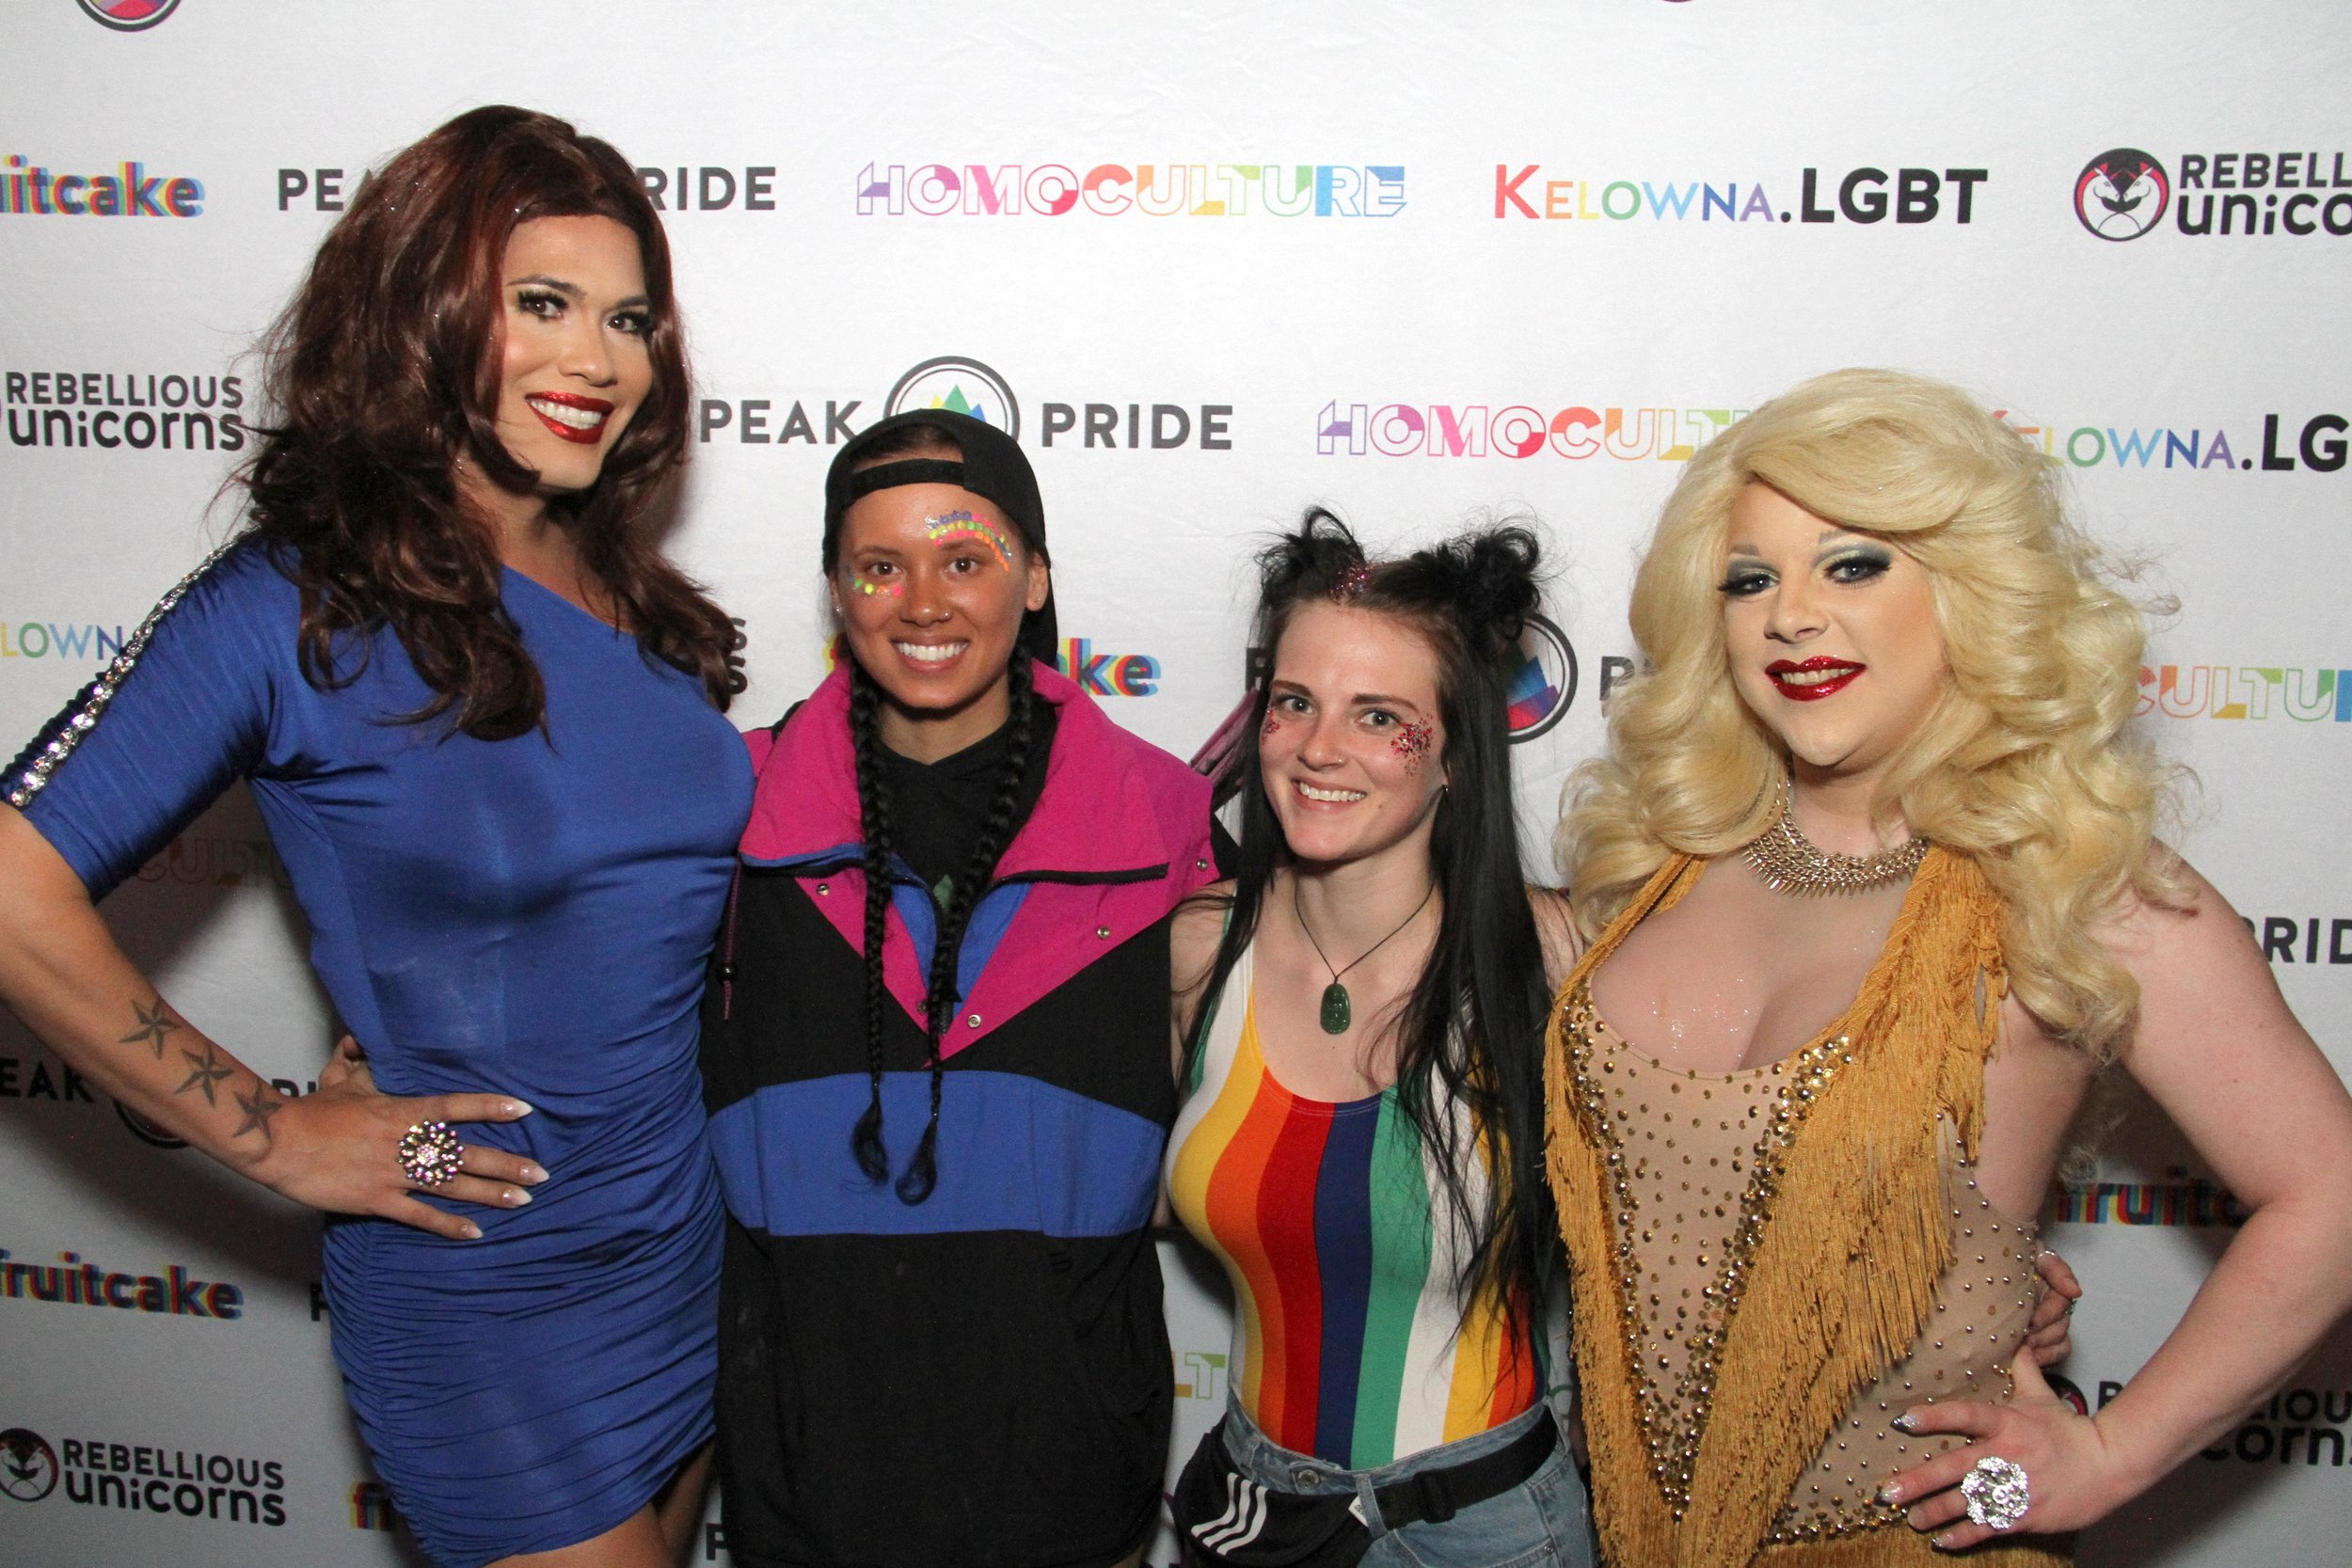 Peak Pride Big White Photo credit: The Homoculture